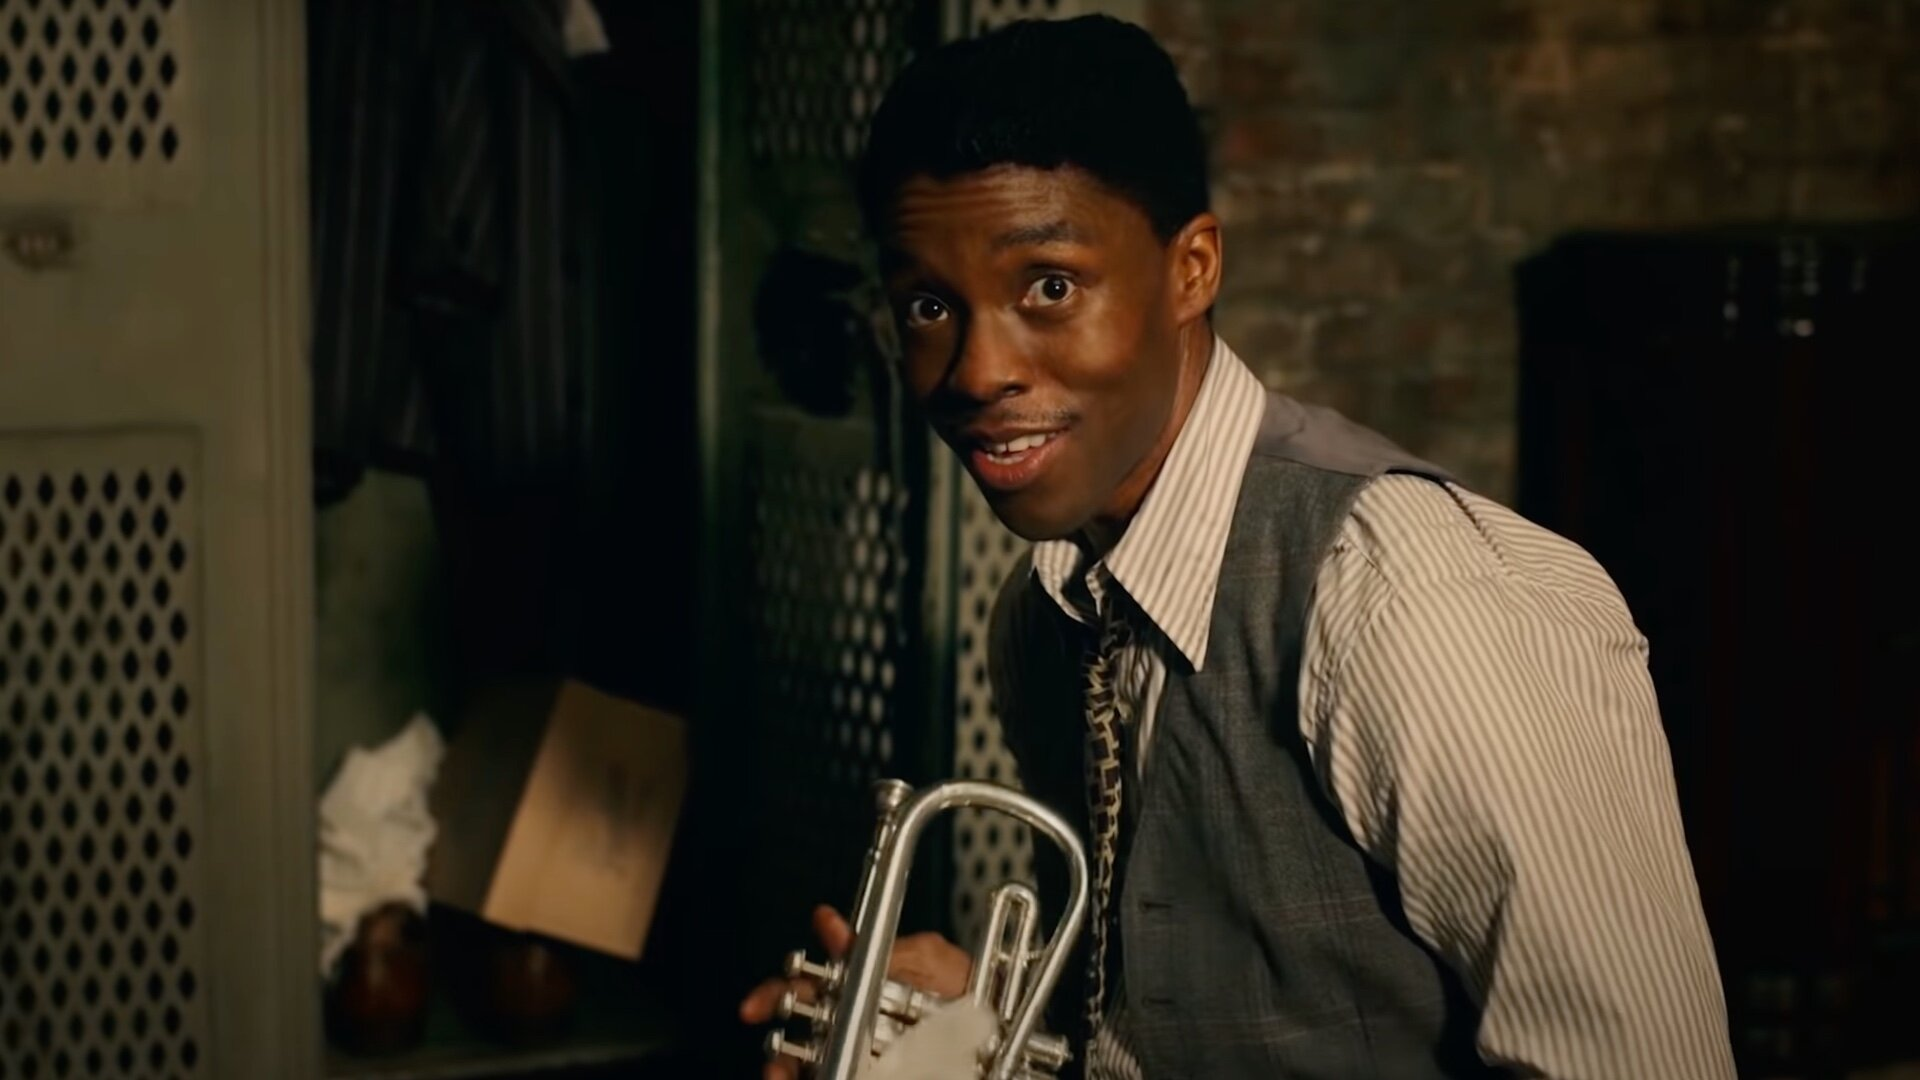 Chadwick Boseman: A Man Among Men' Promo Trailer for MA RAINEY'S BLACK  BOTTOM on Netflix Today — GeekTyrant